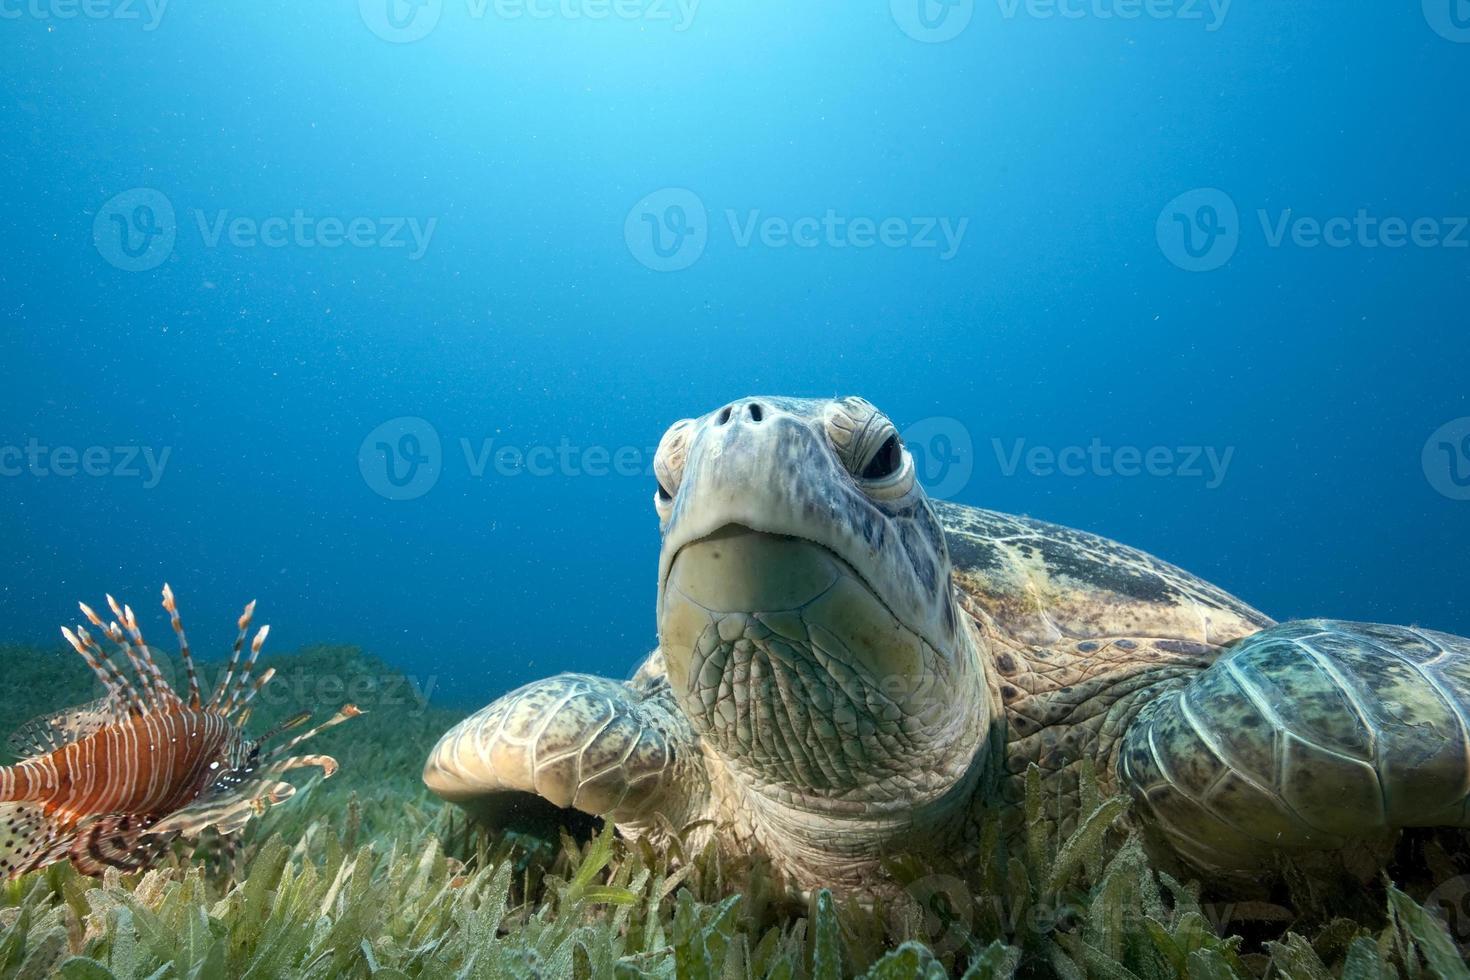 tartaruga verde e grama do mar foto